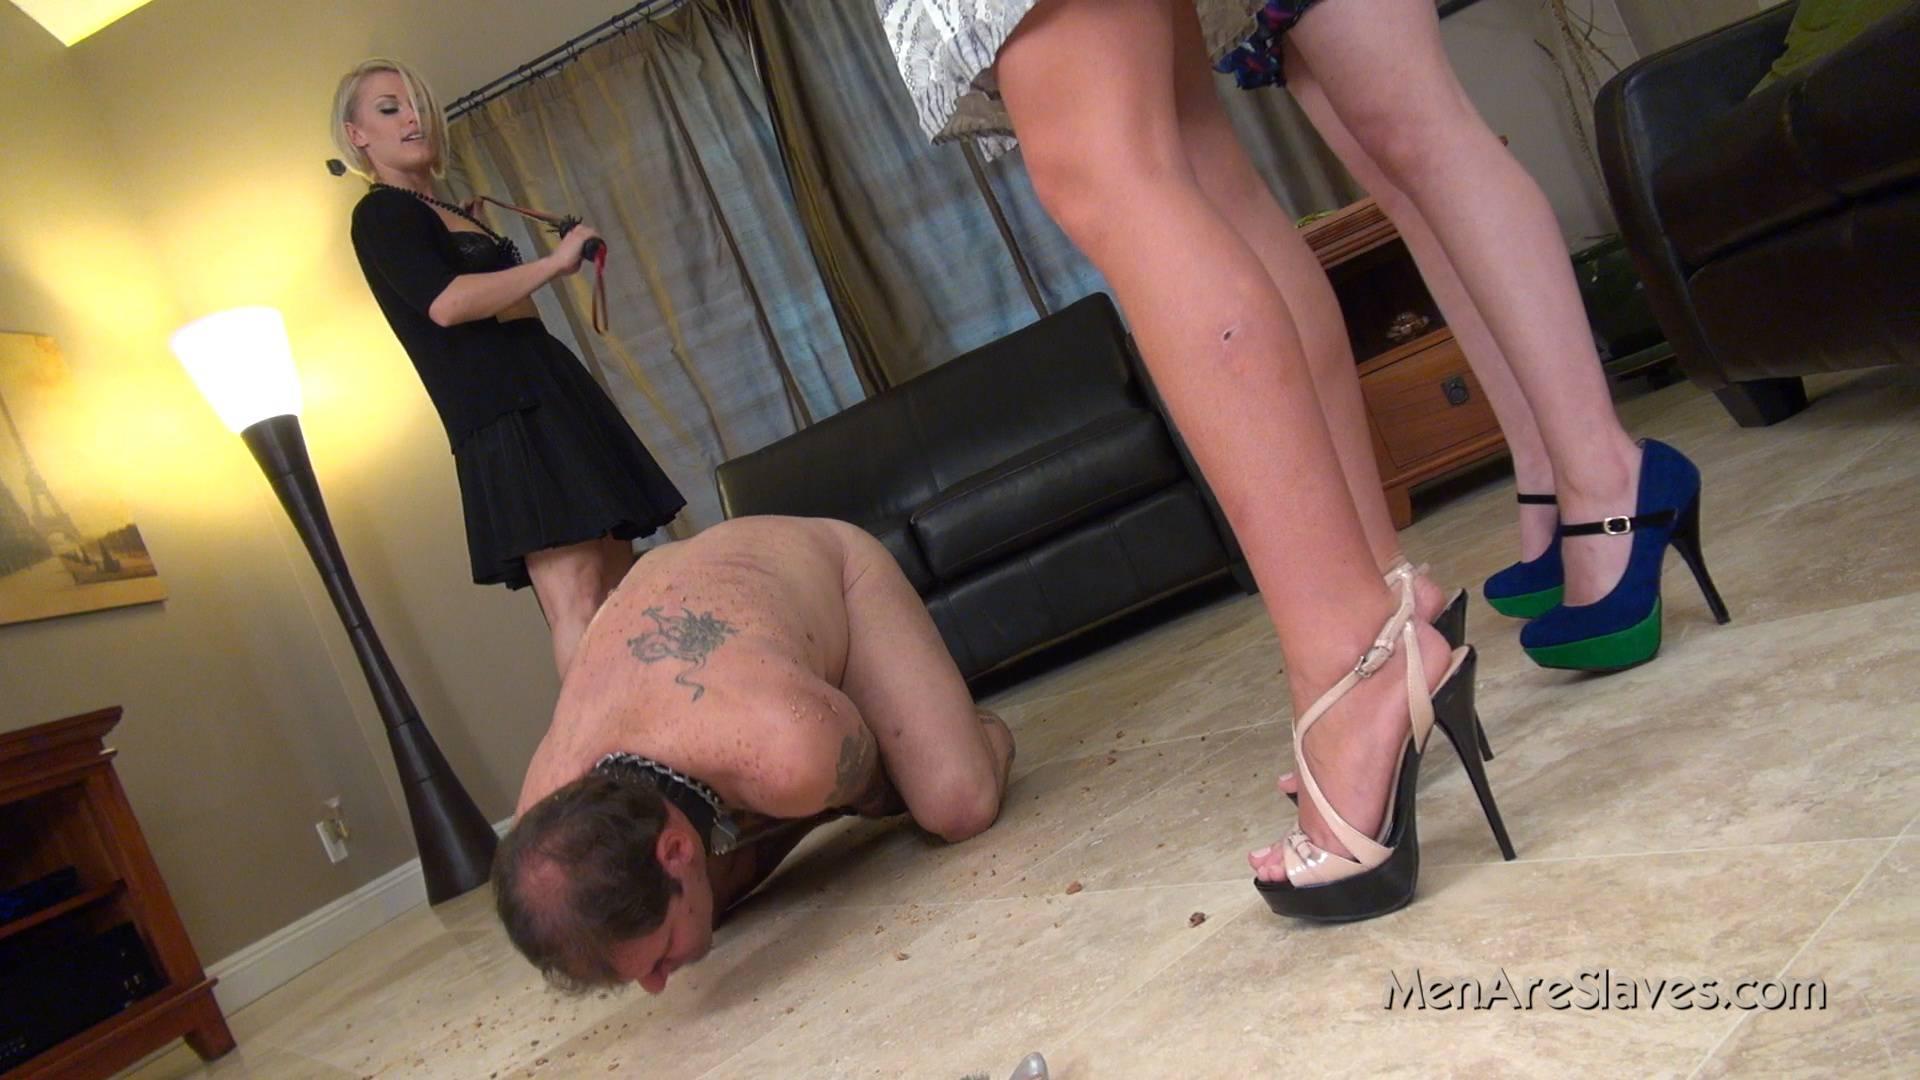 Housecleaning Female Domination World